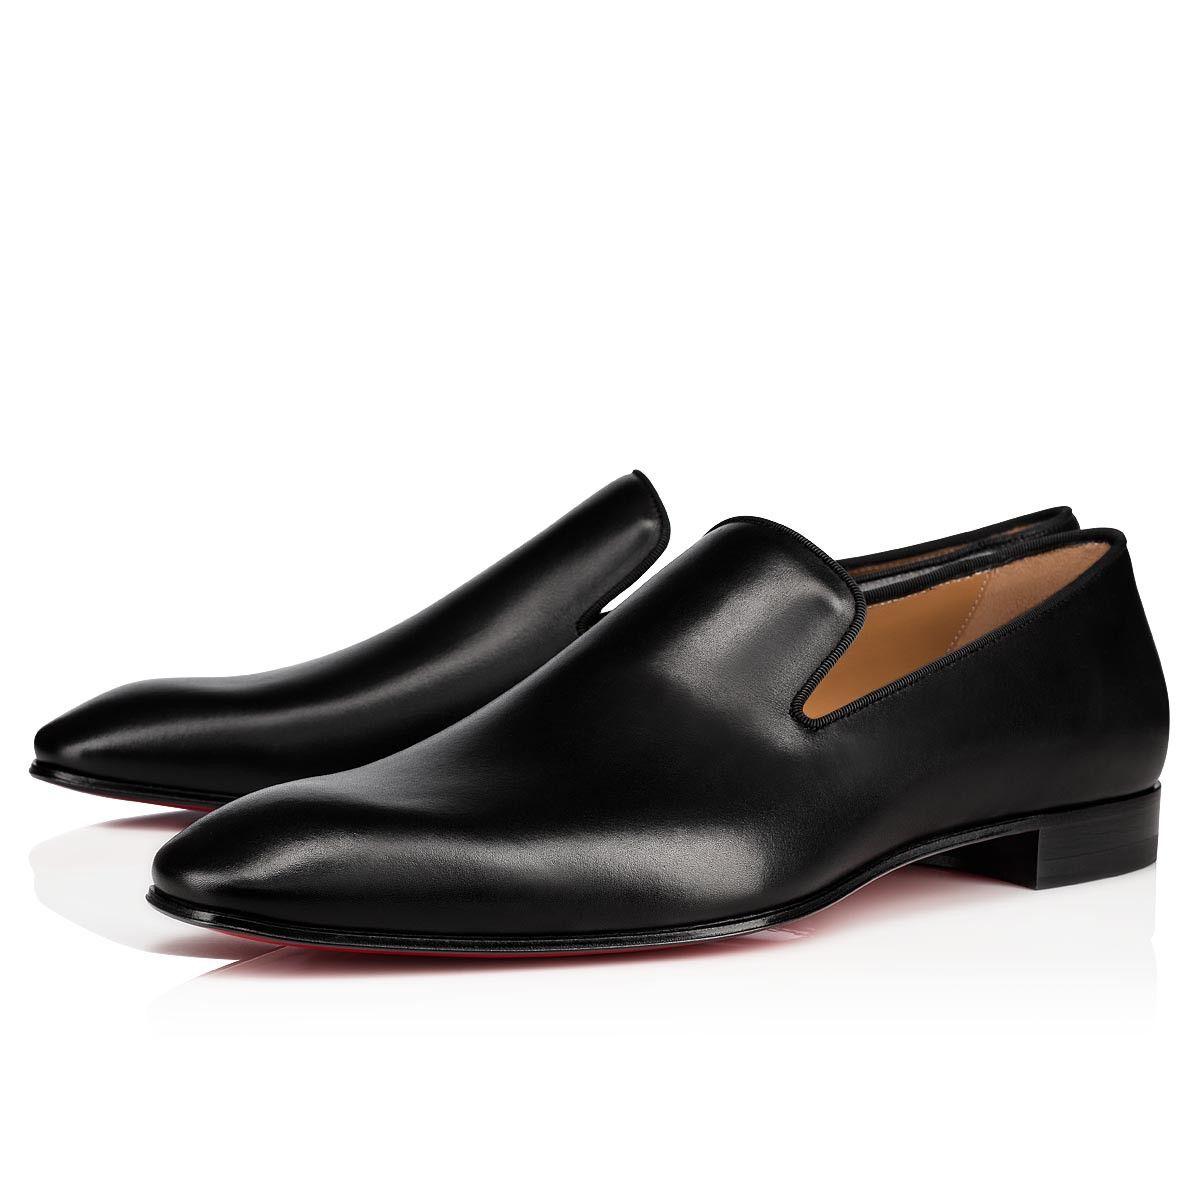 Dandelion Black Calf Men Shoes Christian Louboutin Louboutin Shoes Mens Christian Louboutin Men Loafers Men [ 1200 x 1200 Pixel ]